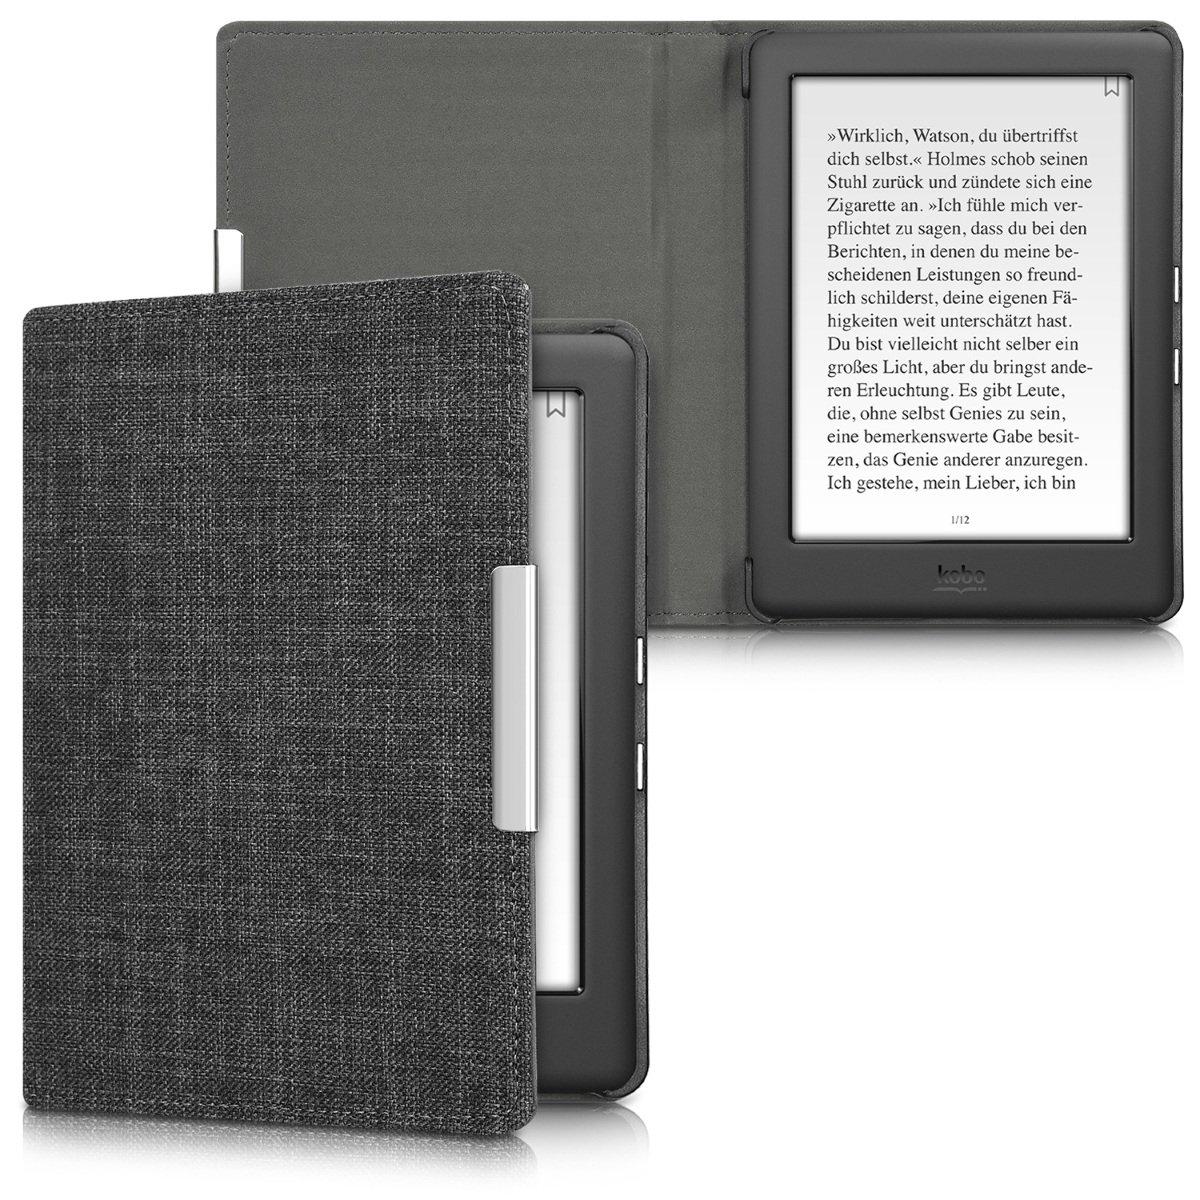 B076KQJHHF kwmobile Case for Kobo Glo HD/Touch 2.0 - Book Style Fabric Protective e-Reader Cover Flip Folio Case - Dark Grey 81goioyo1dL